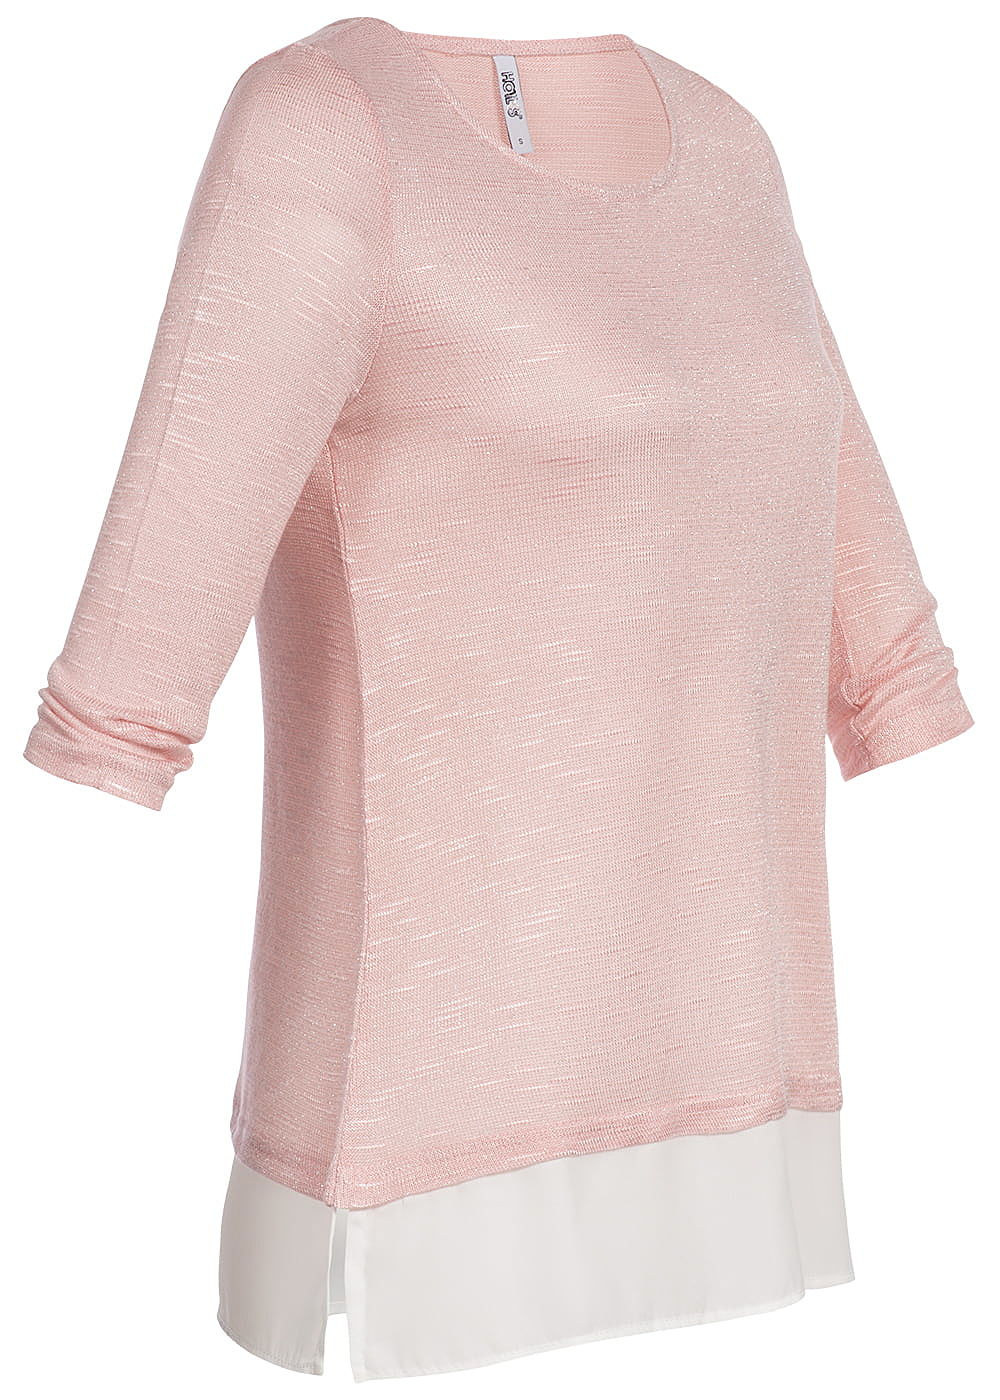 6ccd1831e601da Hailys Damen 2in1 3 4 Sleeve Shirt Allover Glitter rosa - 77onlineshop